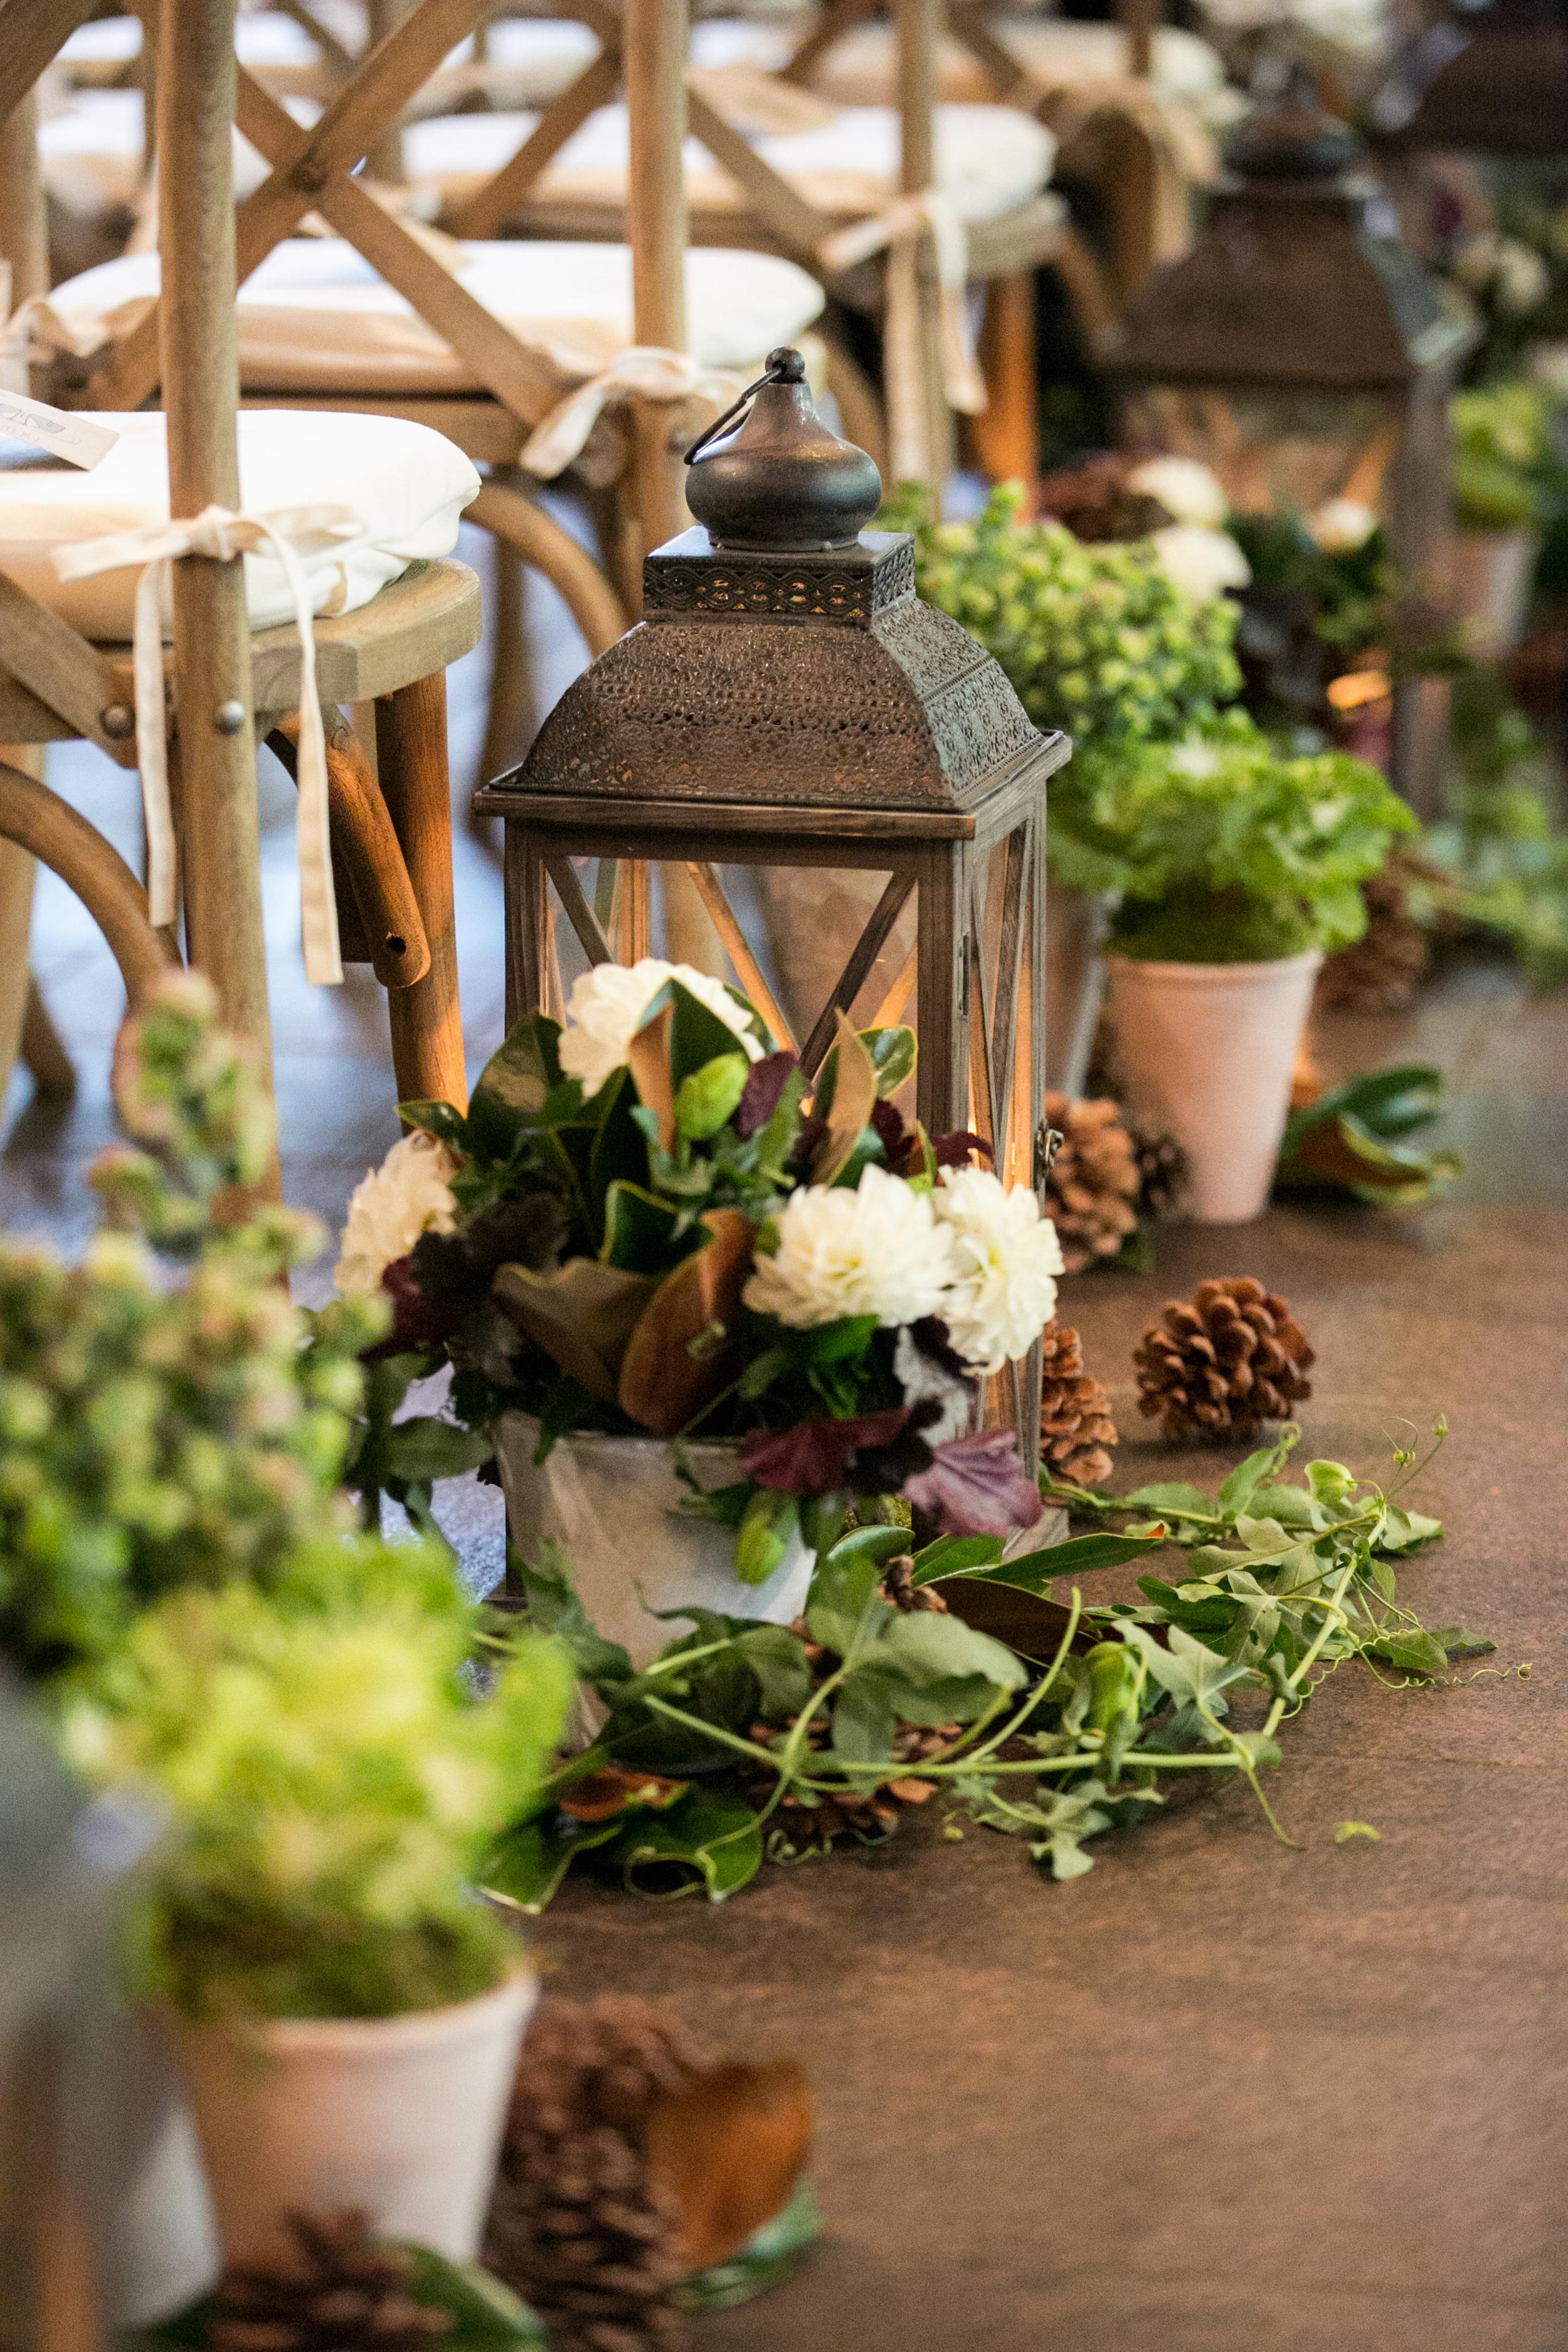 NYC-Wedding-Planner-Andrea-Freeman-Events-Leob-Boathouse-Central-Park-17.jpg